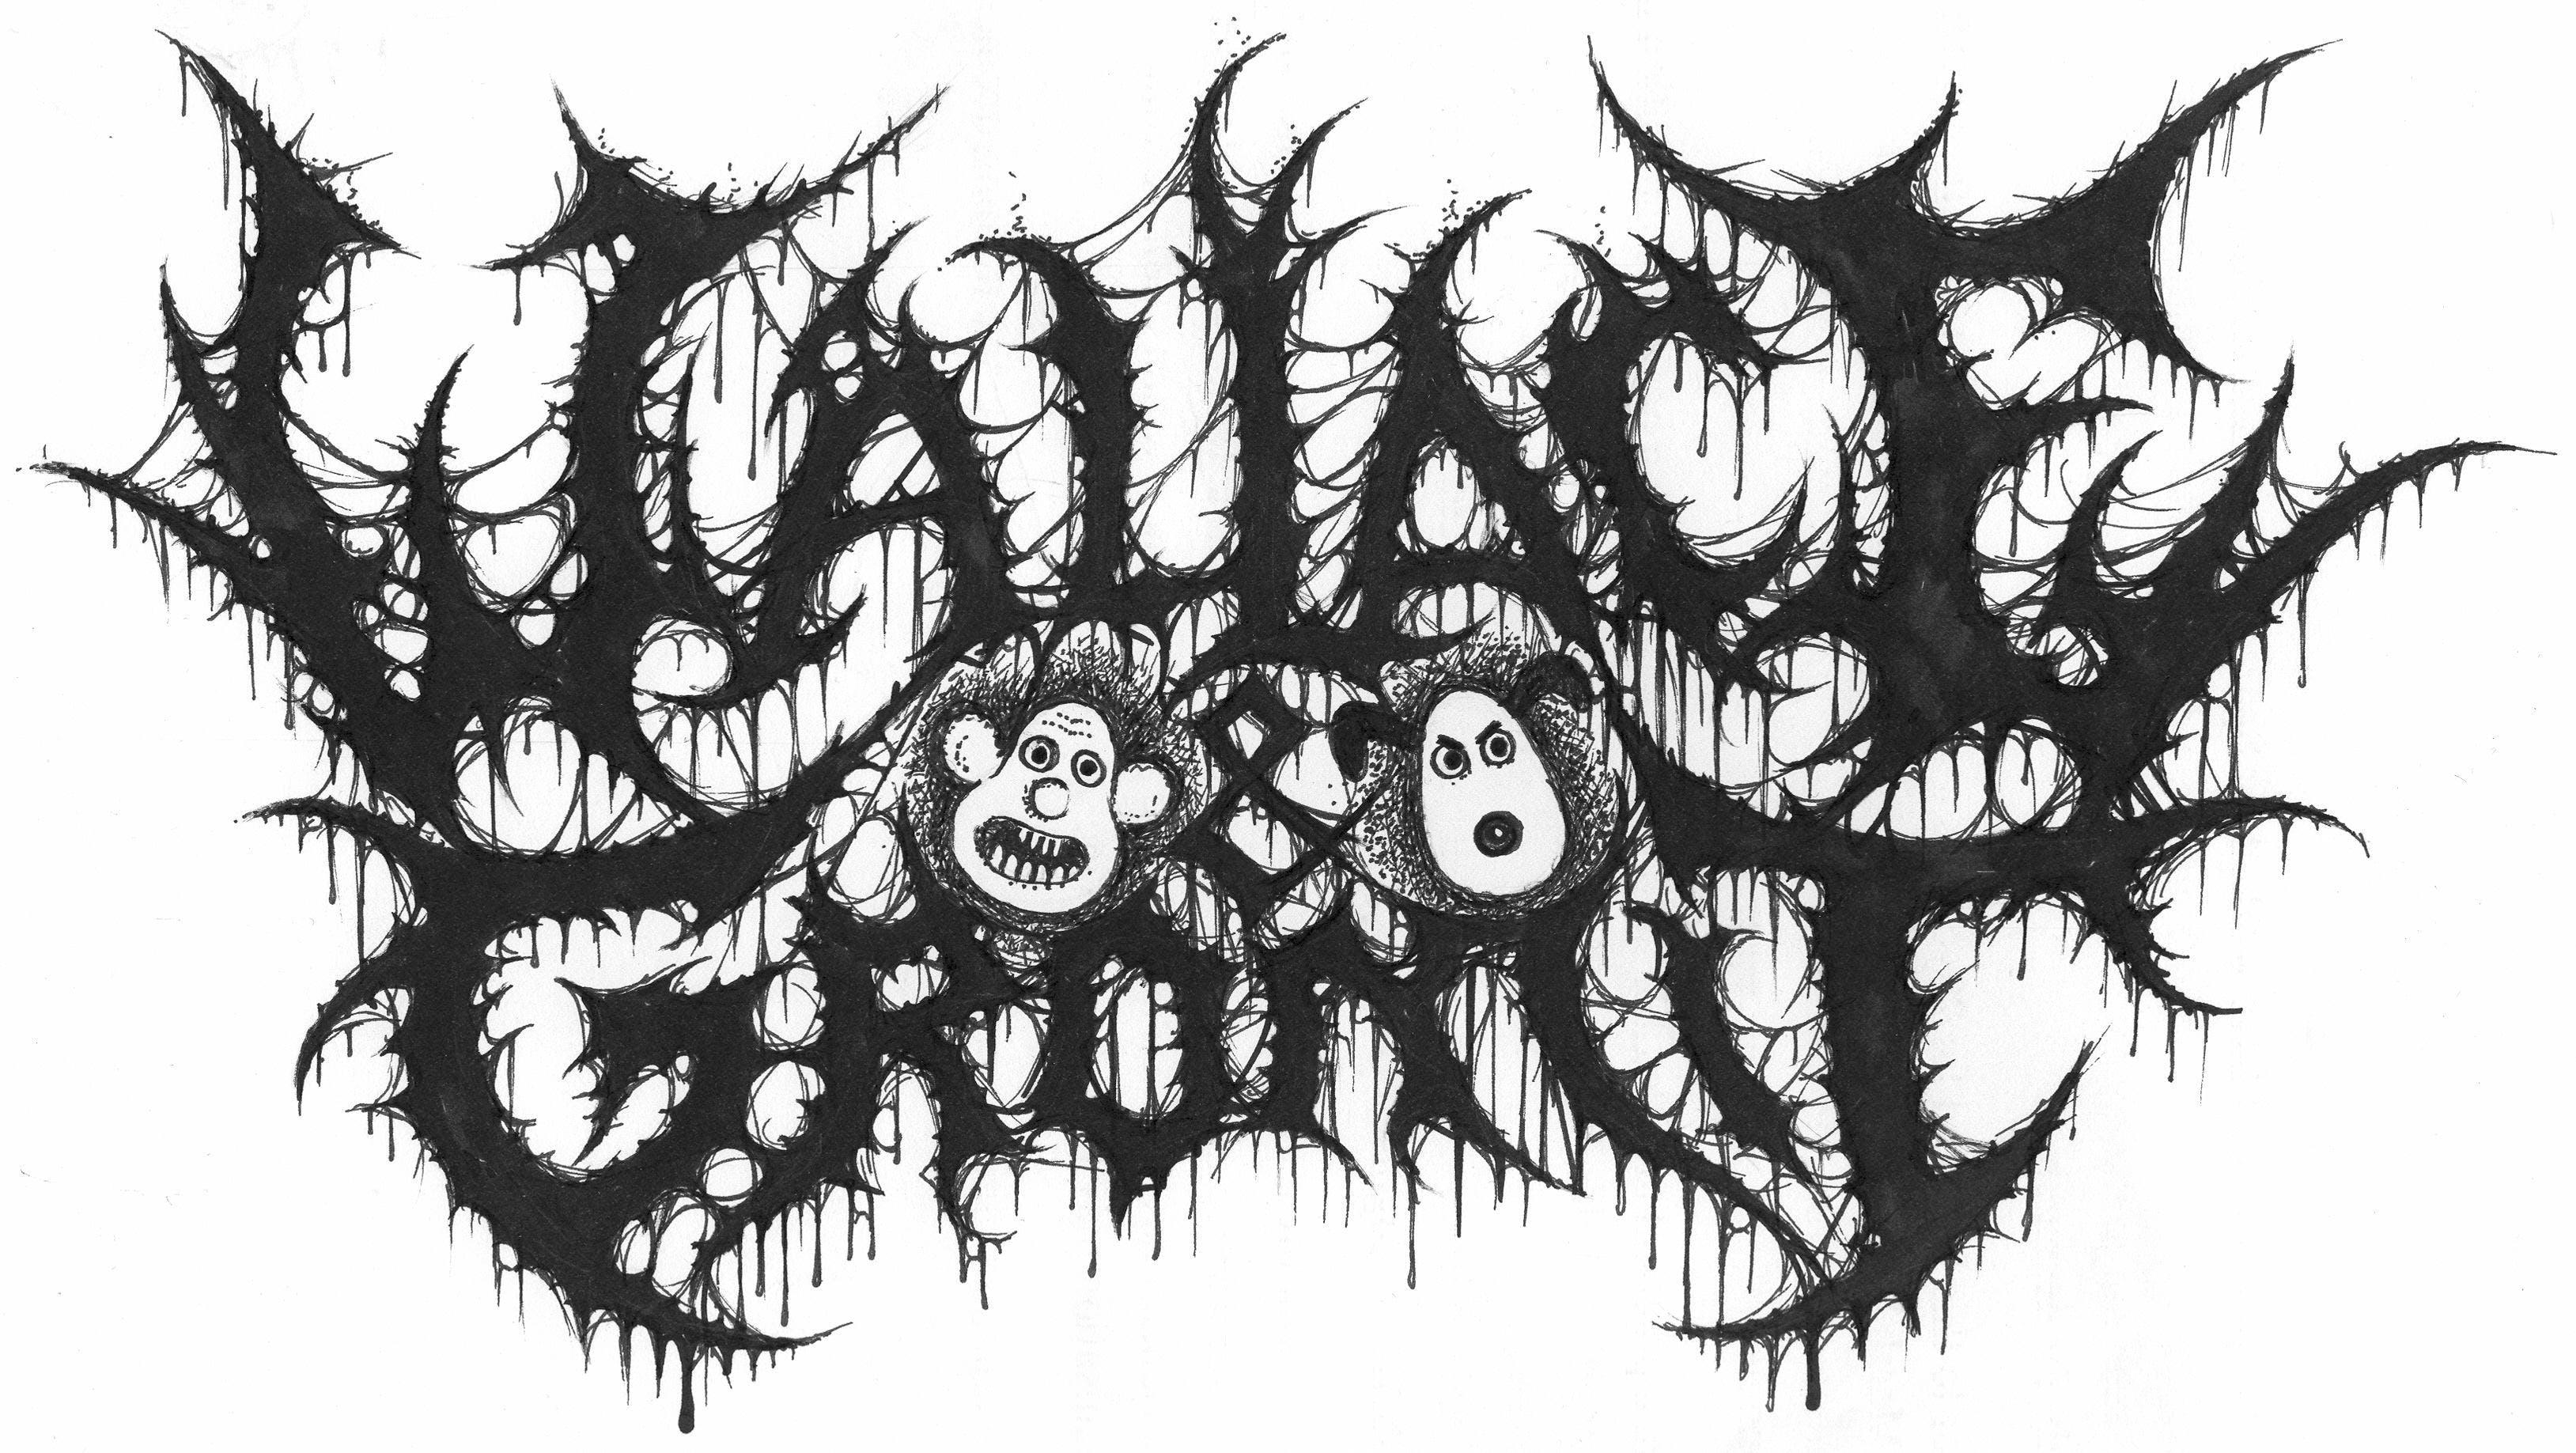 Inside The World Of Extreme Metal Logos — Kerrang!